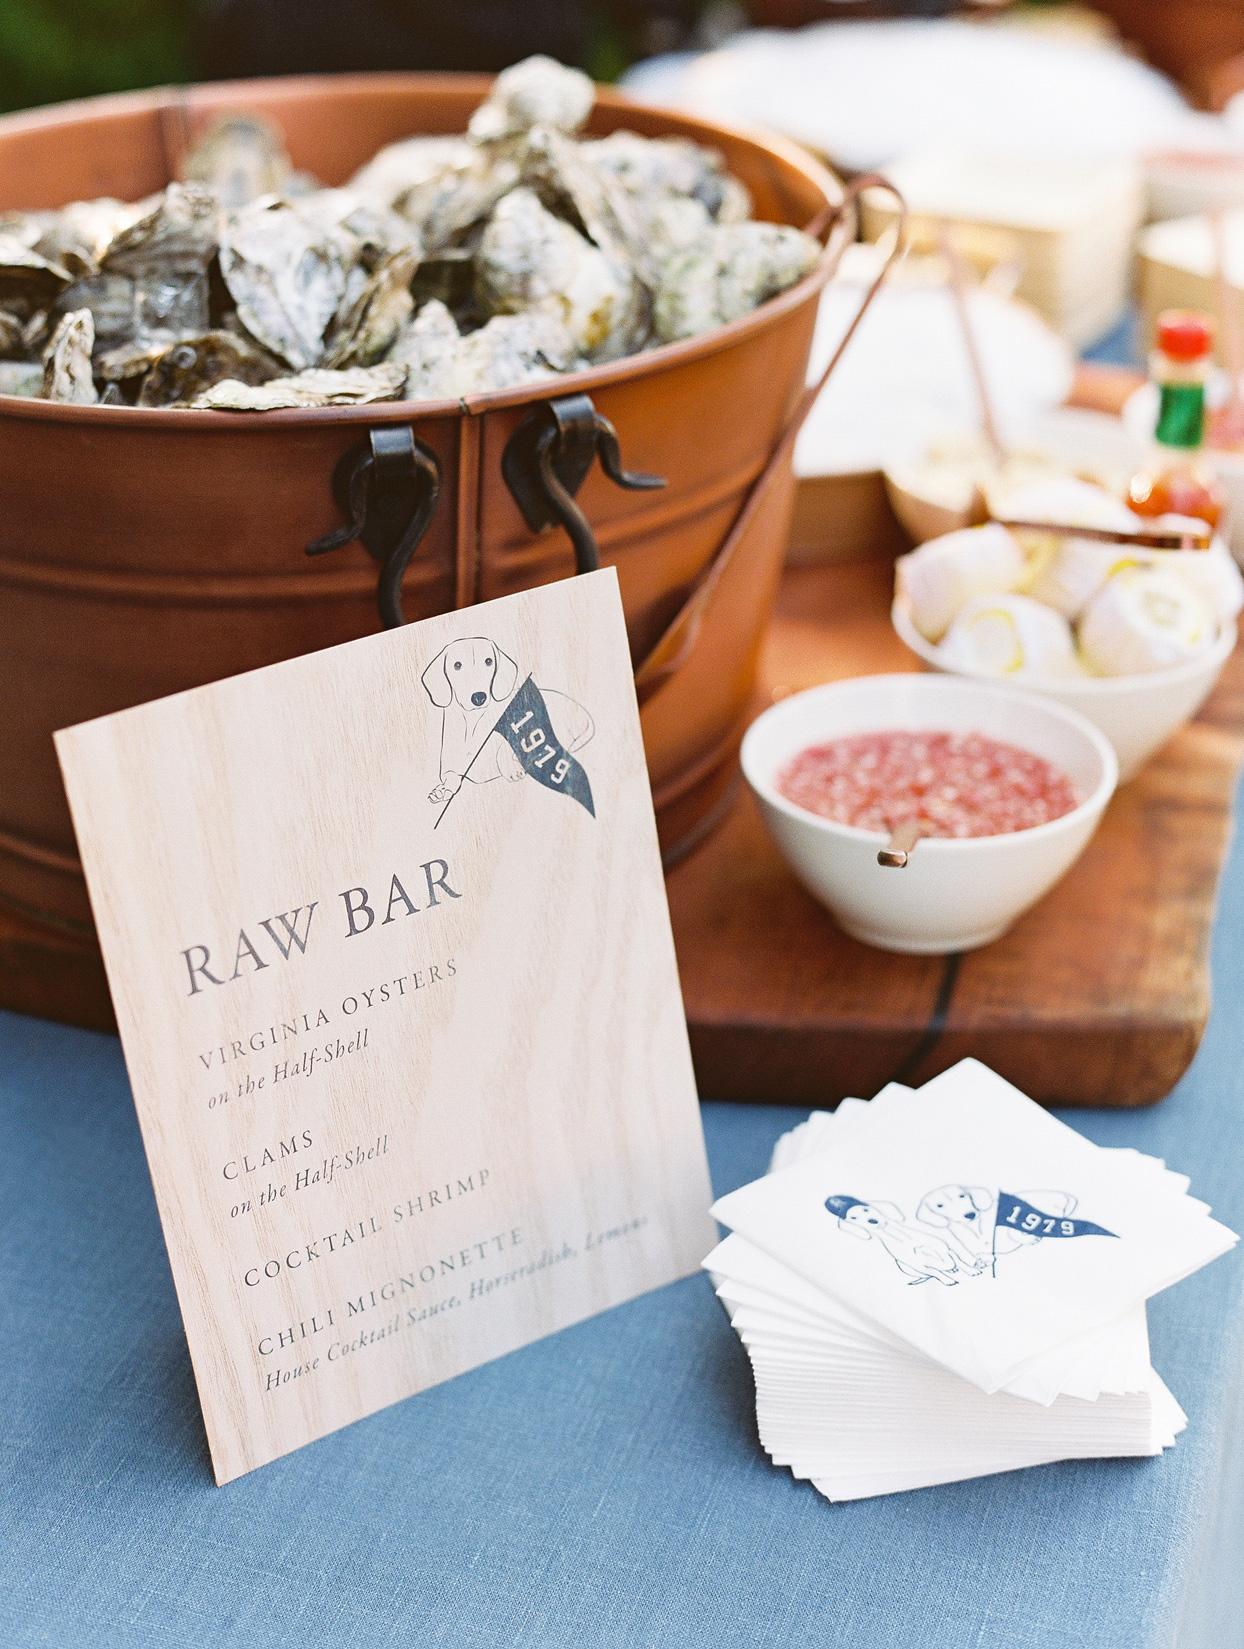 Raw bar anniversary party menu